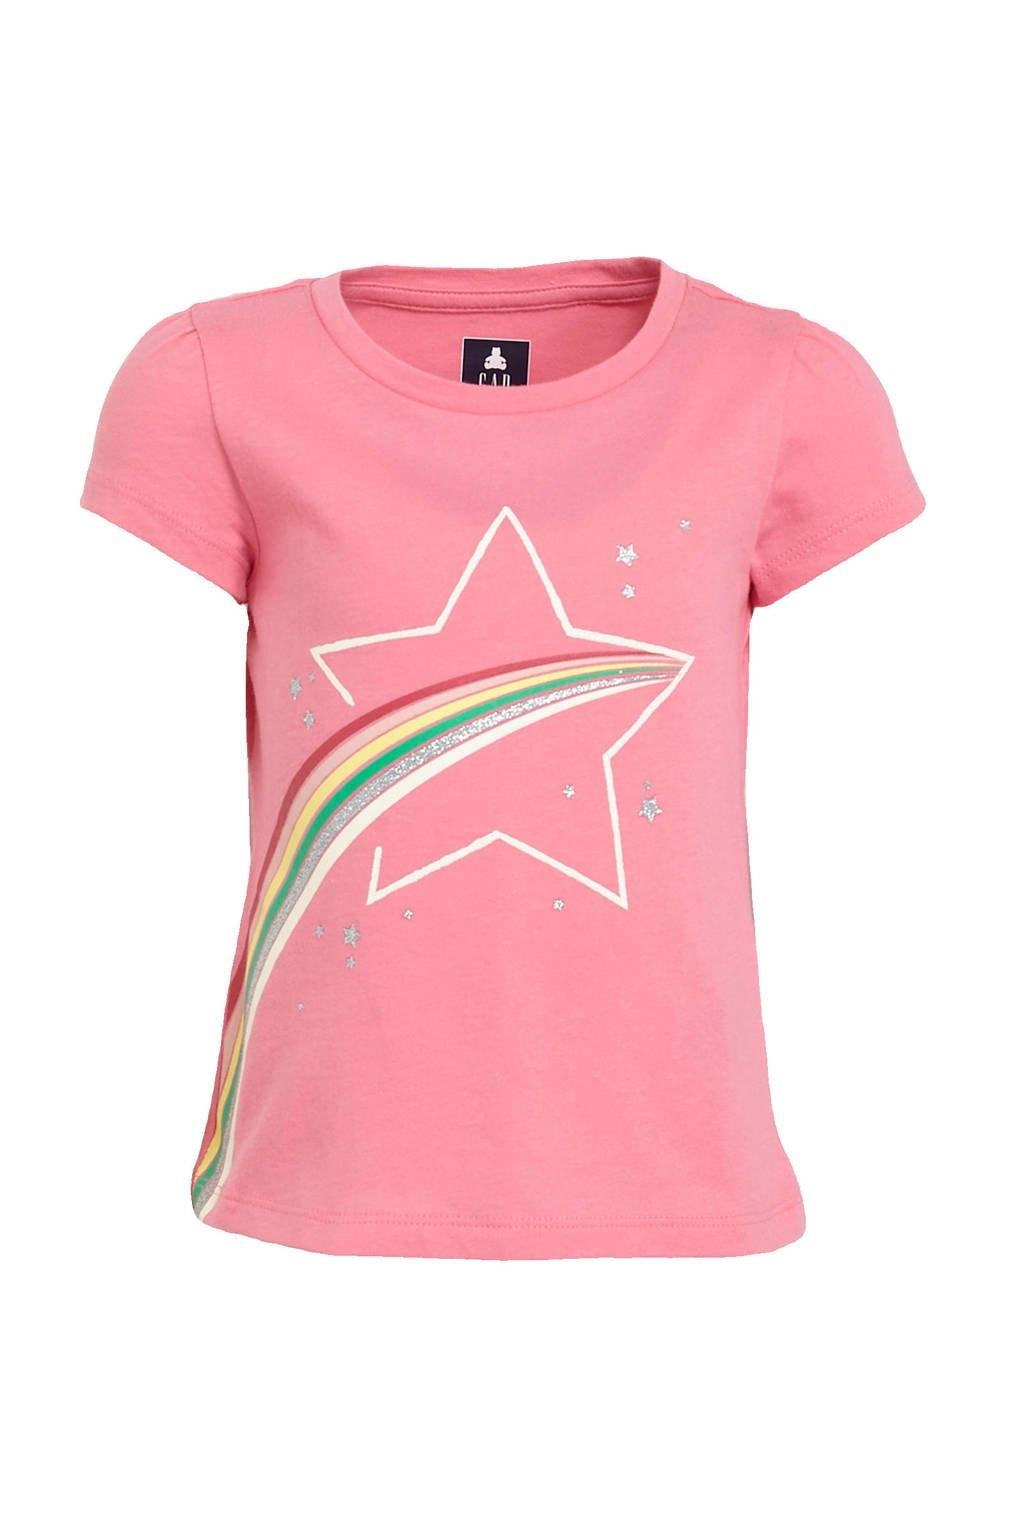 GAP T-shirt met printopdruk roze, Roze